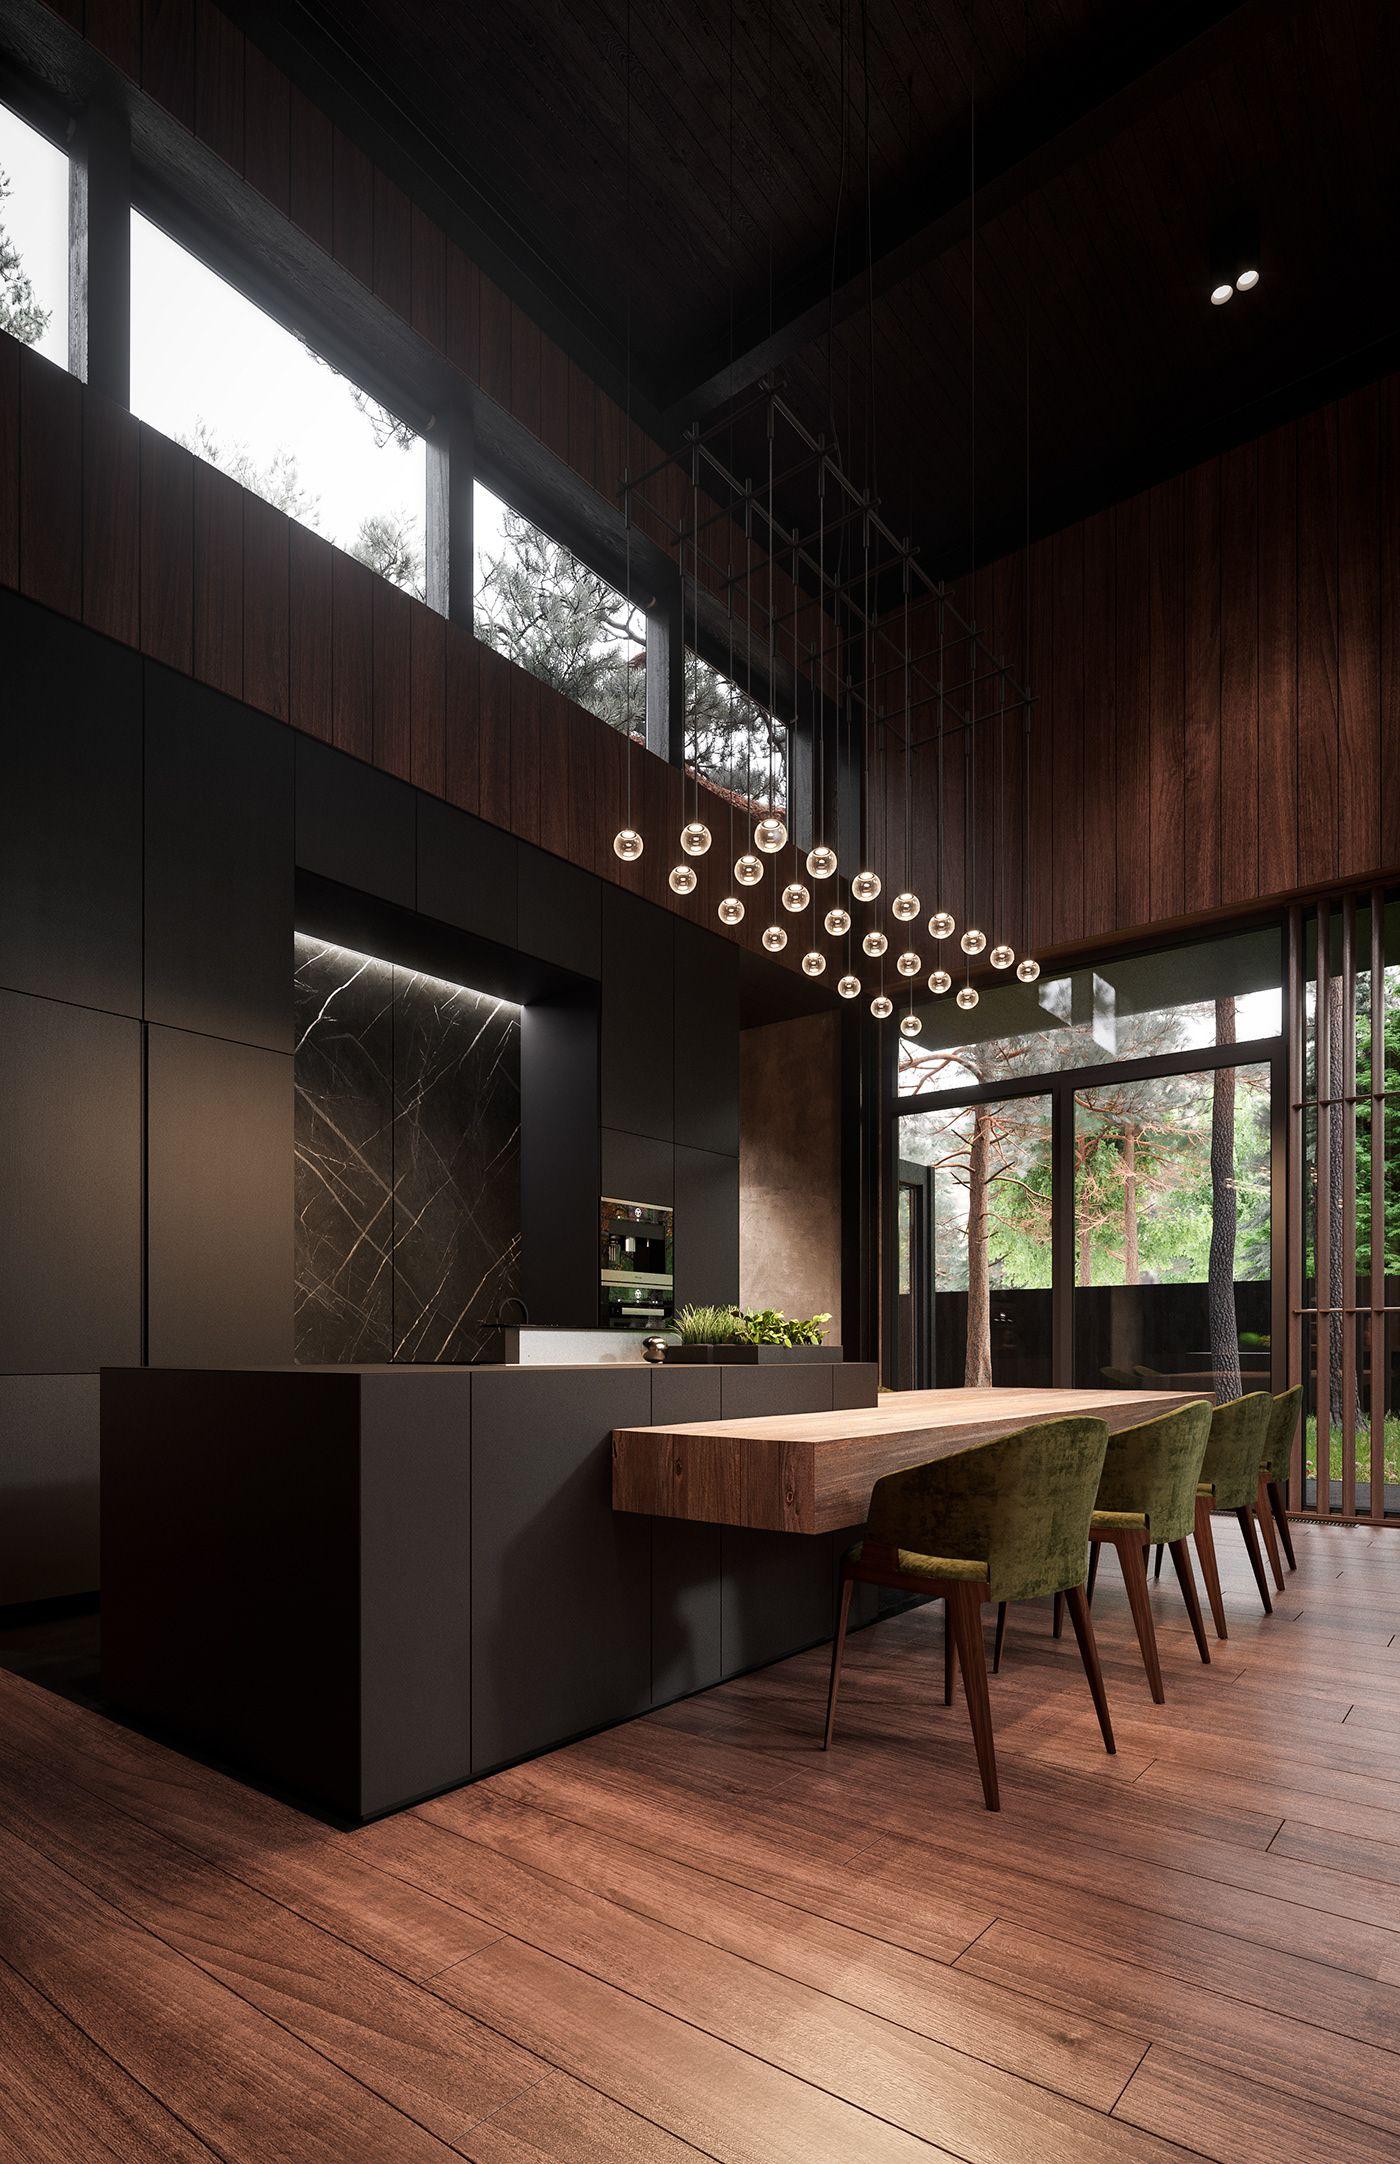 Roma House Interior Buro511 On Behance Moderne Keukens Keuken